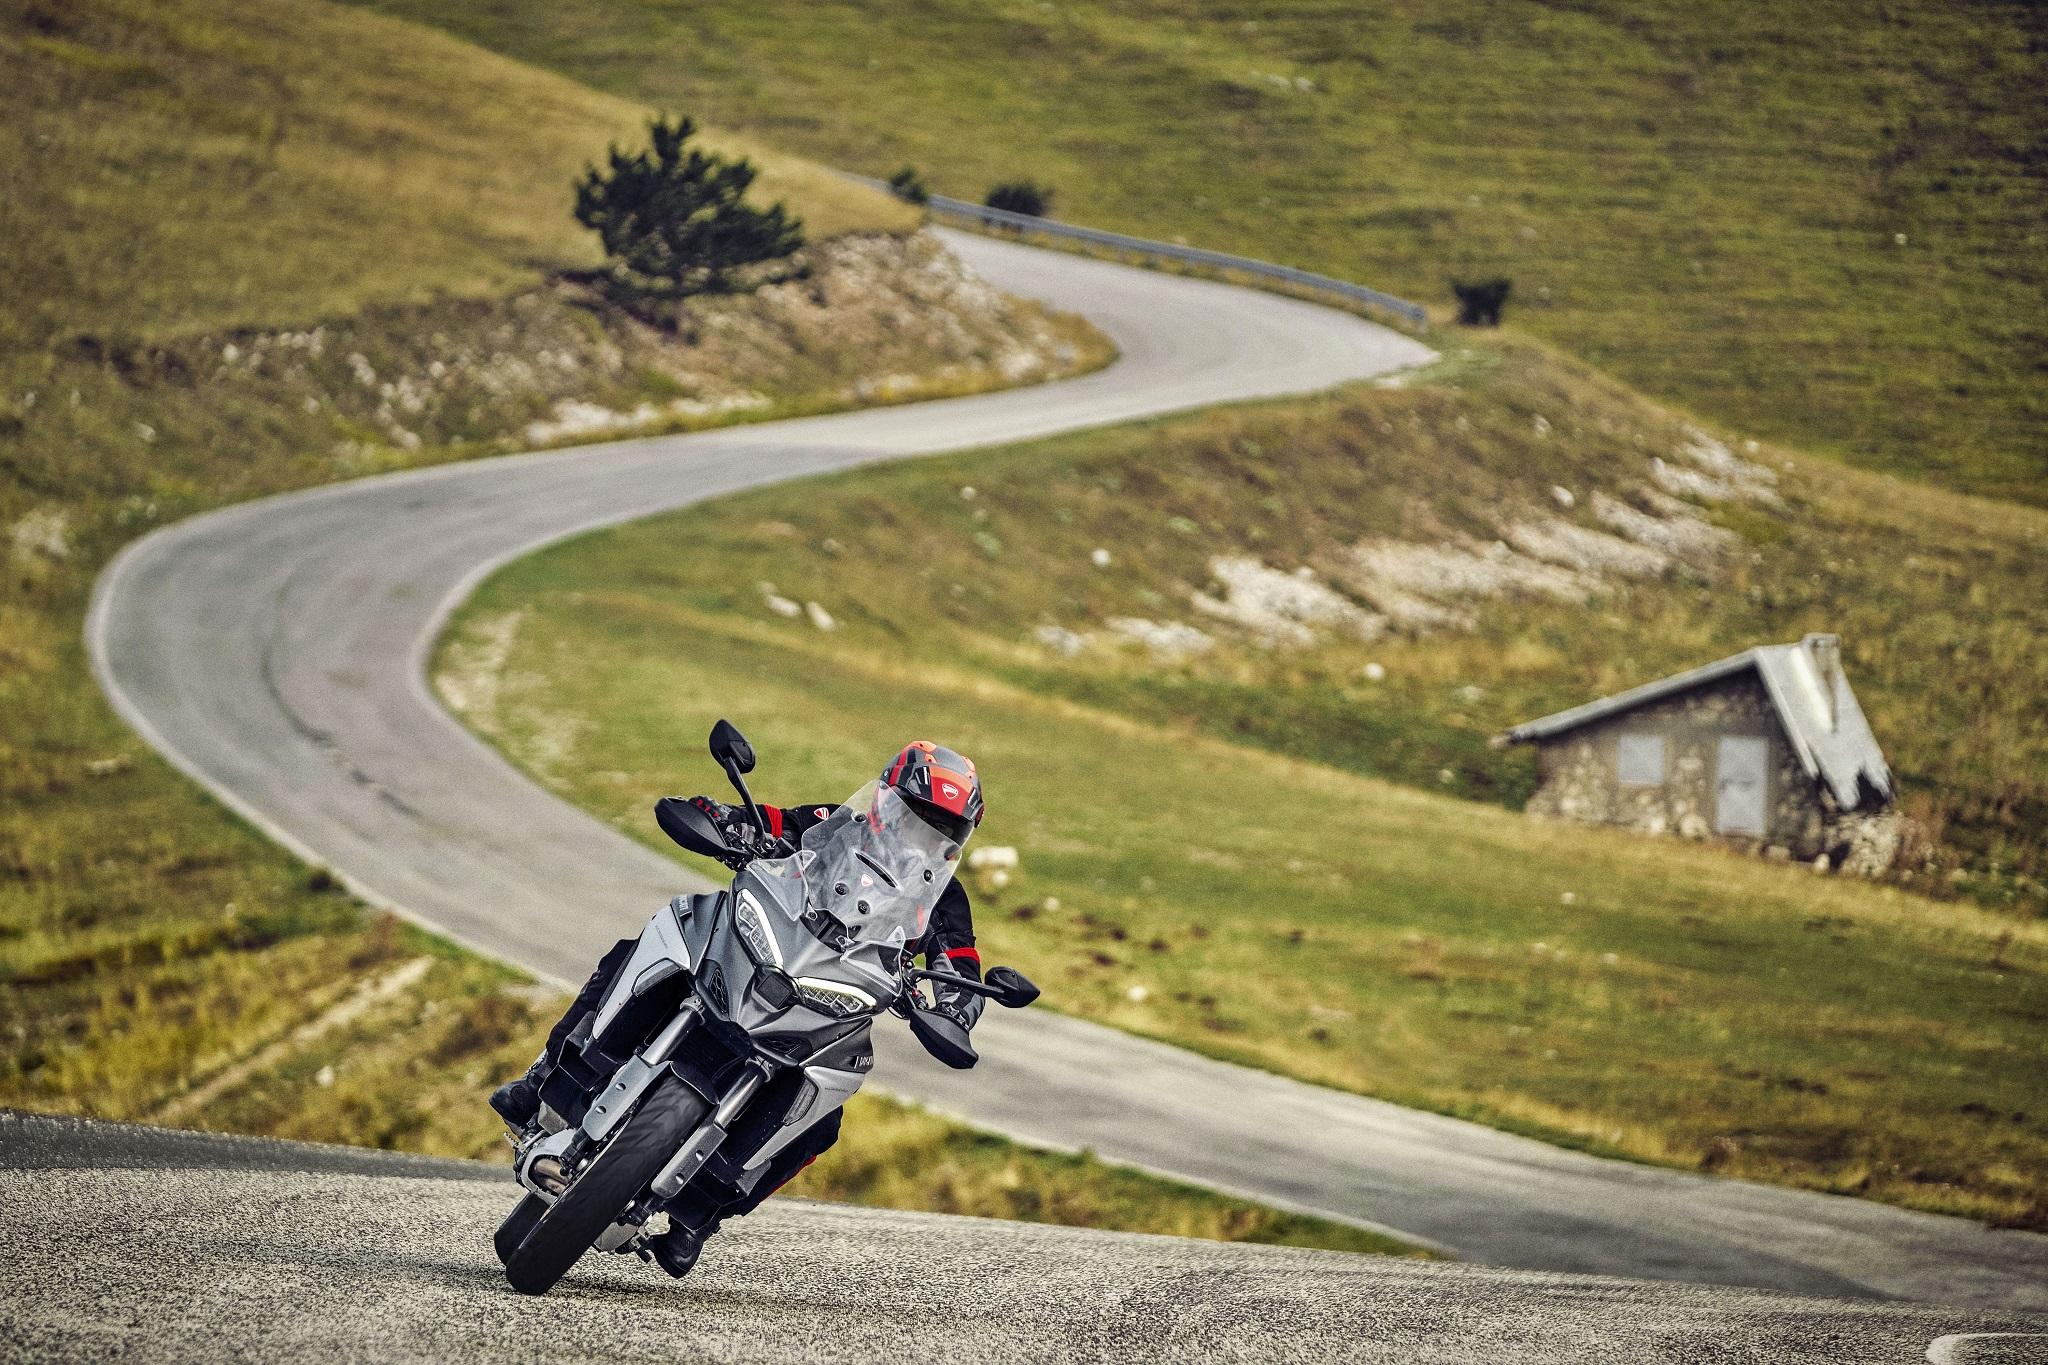 La Ducati Multistrada V4